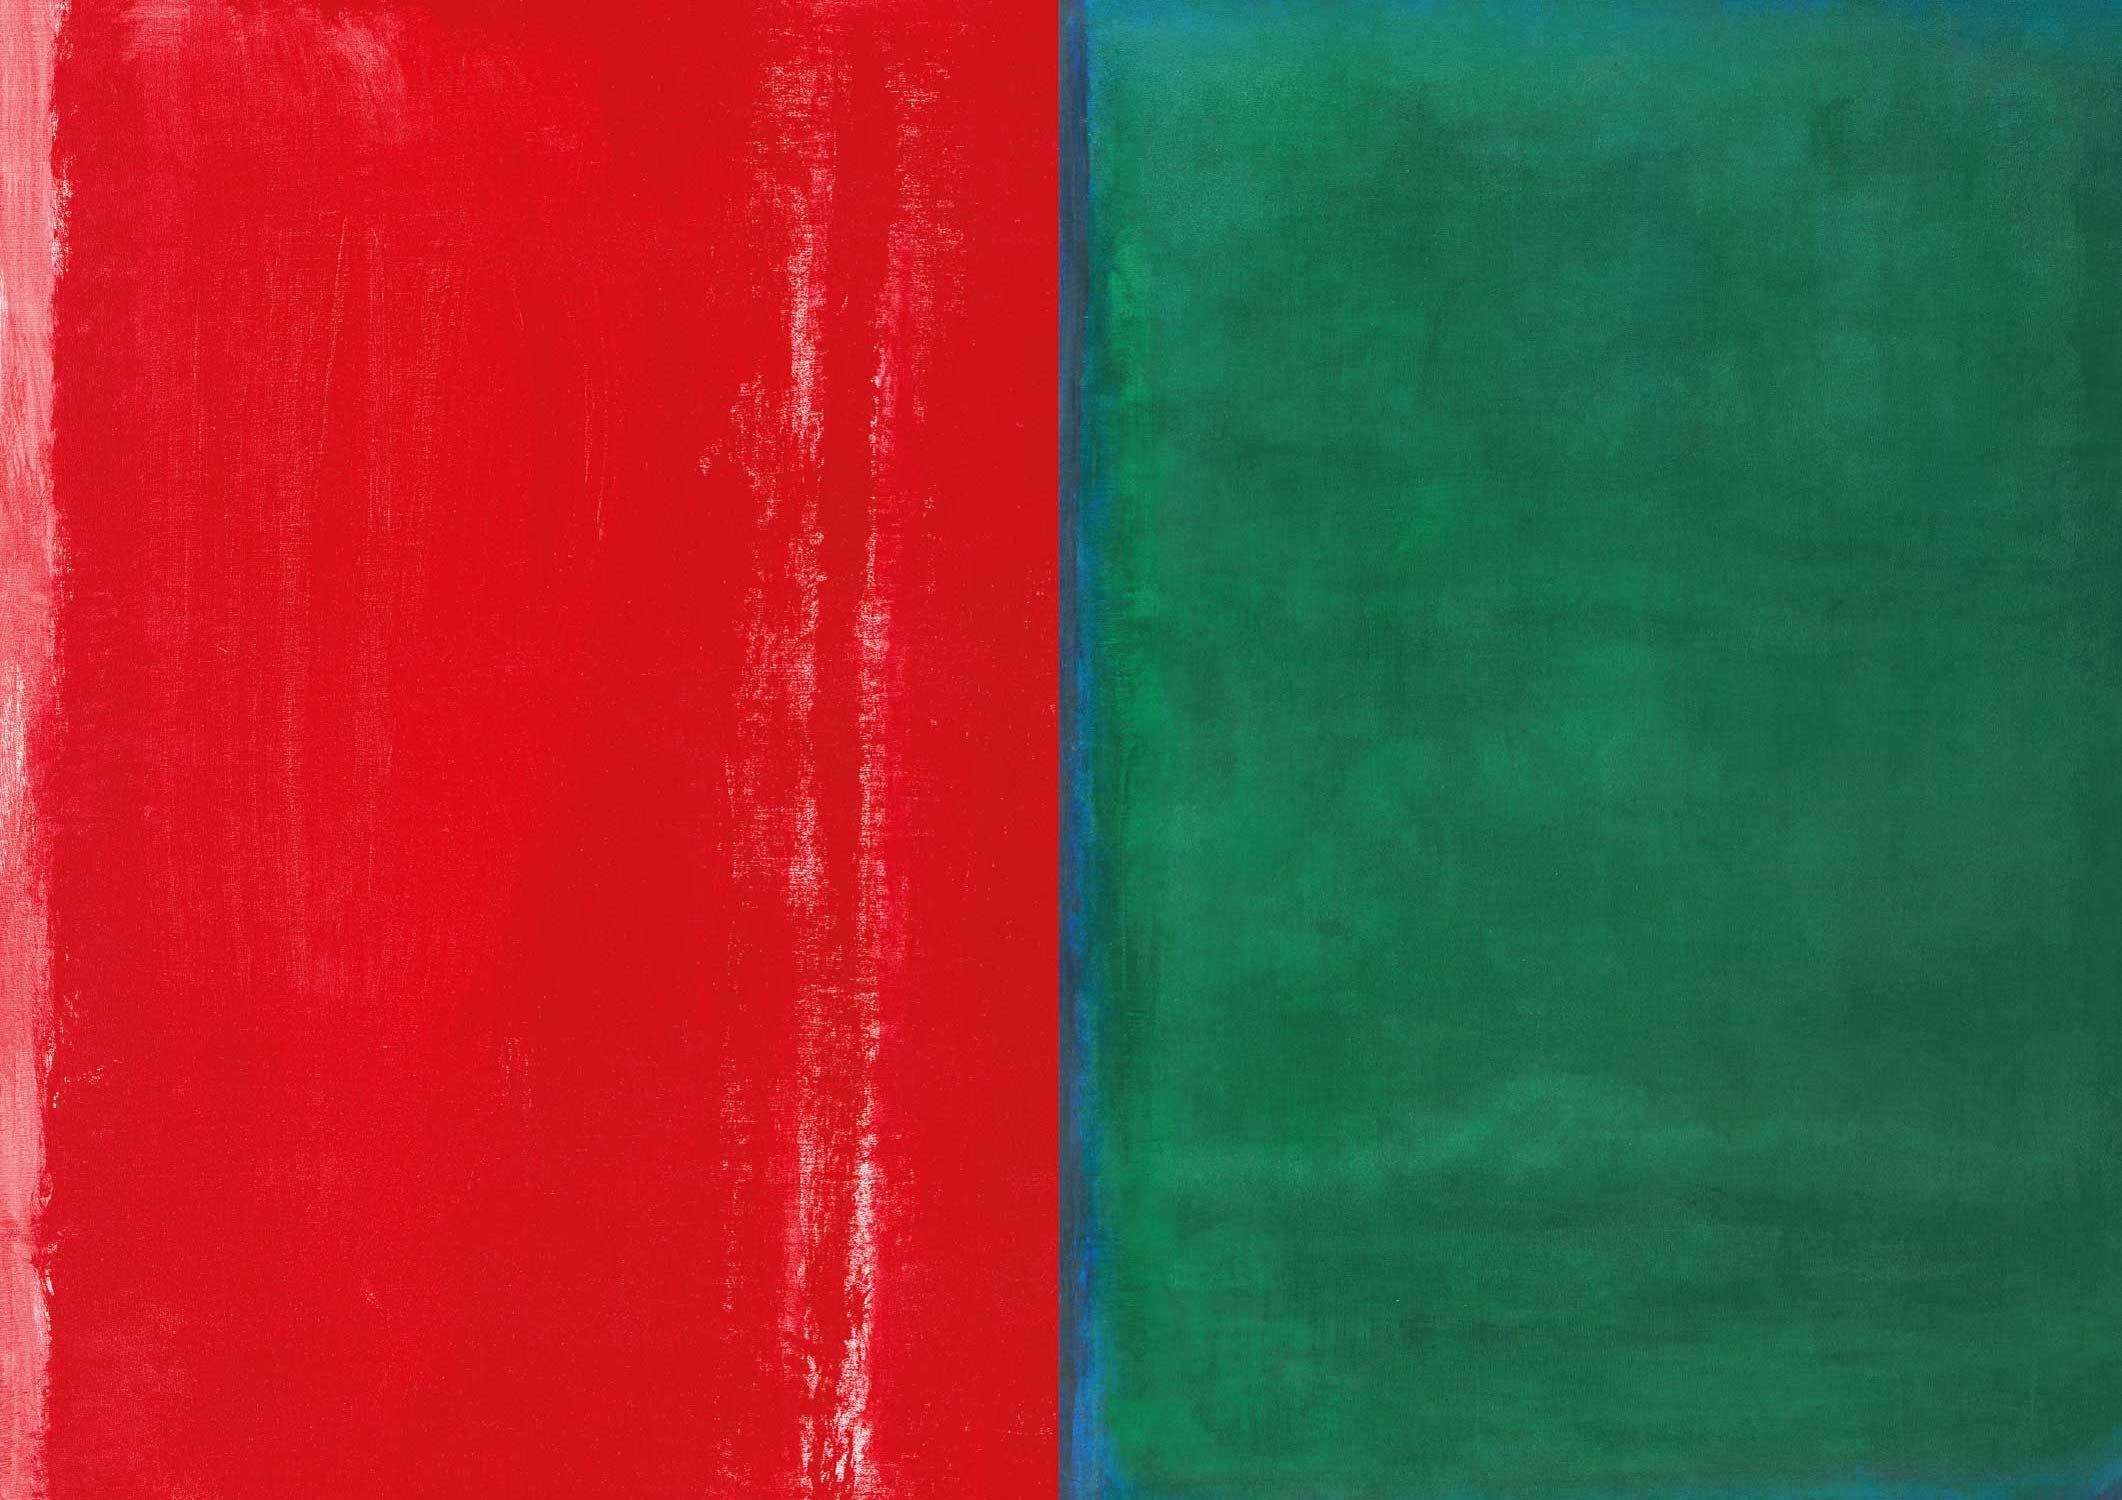 Best_Optyk_Rothko-red-and-green.jpg